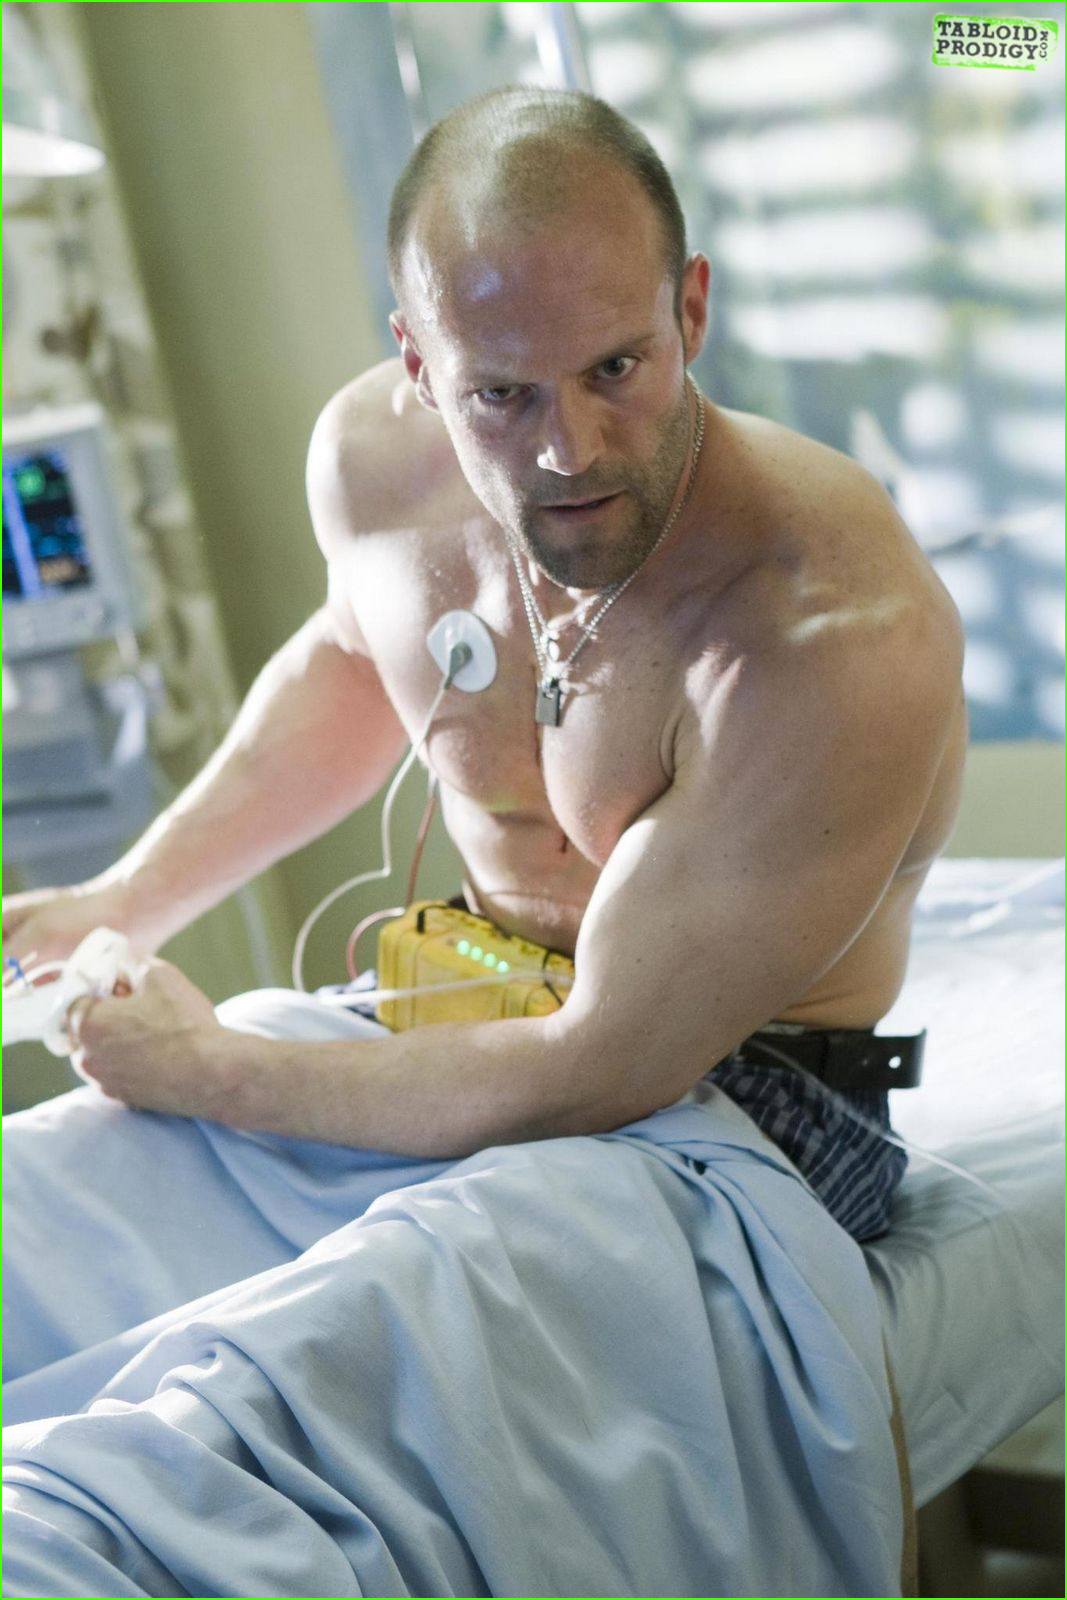 http://4.bp.blogspot.com/-zgdaed_9NSI/TmaEwKA74SI/AAAAAAAAAnM/xzZxRkxmiUc/s1600/jason_statham_shirtless_mens_health4.jpg